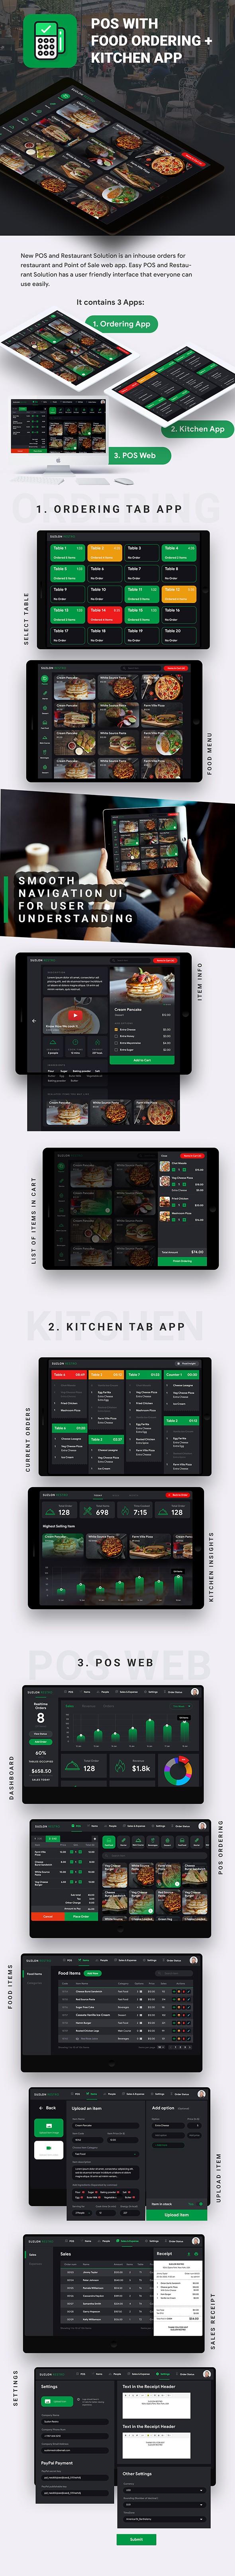 Restaurant Kitchen App + Restaurant Menu App+ Restaurant POS Web App | Android+iOS | IONIC 5 - 3